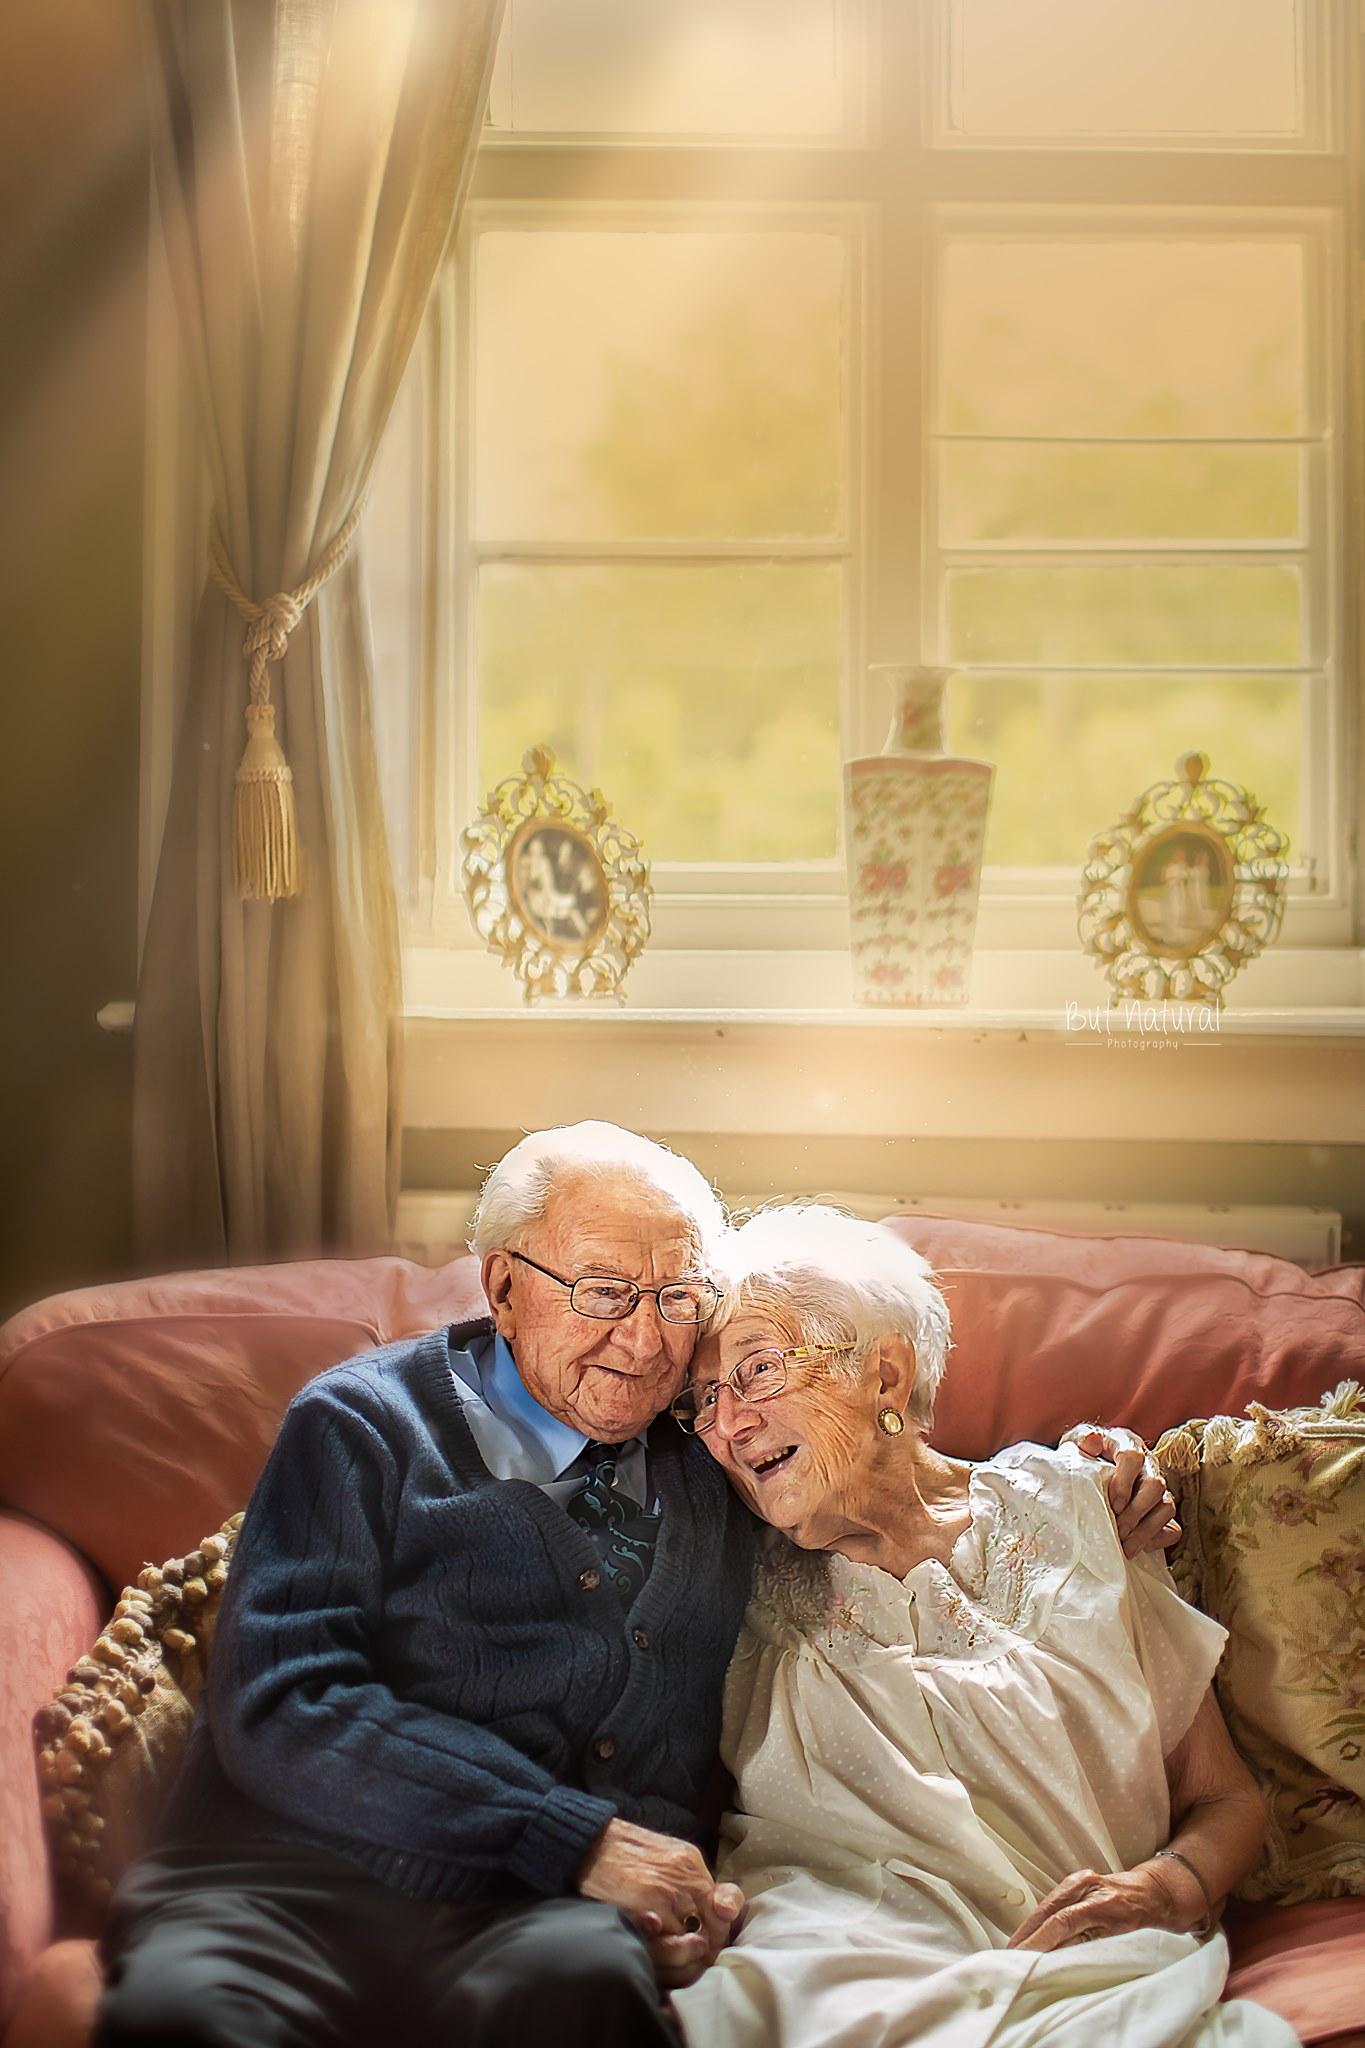 Senior couples | Elderly Photoshoot by Sujata Setia - But Natural Photography